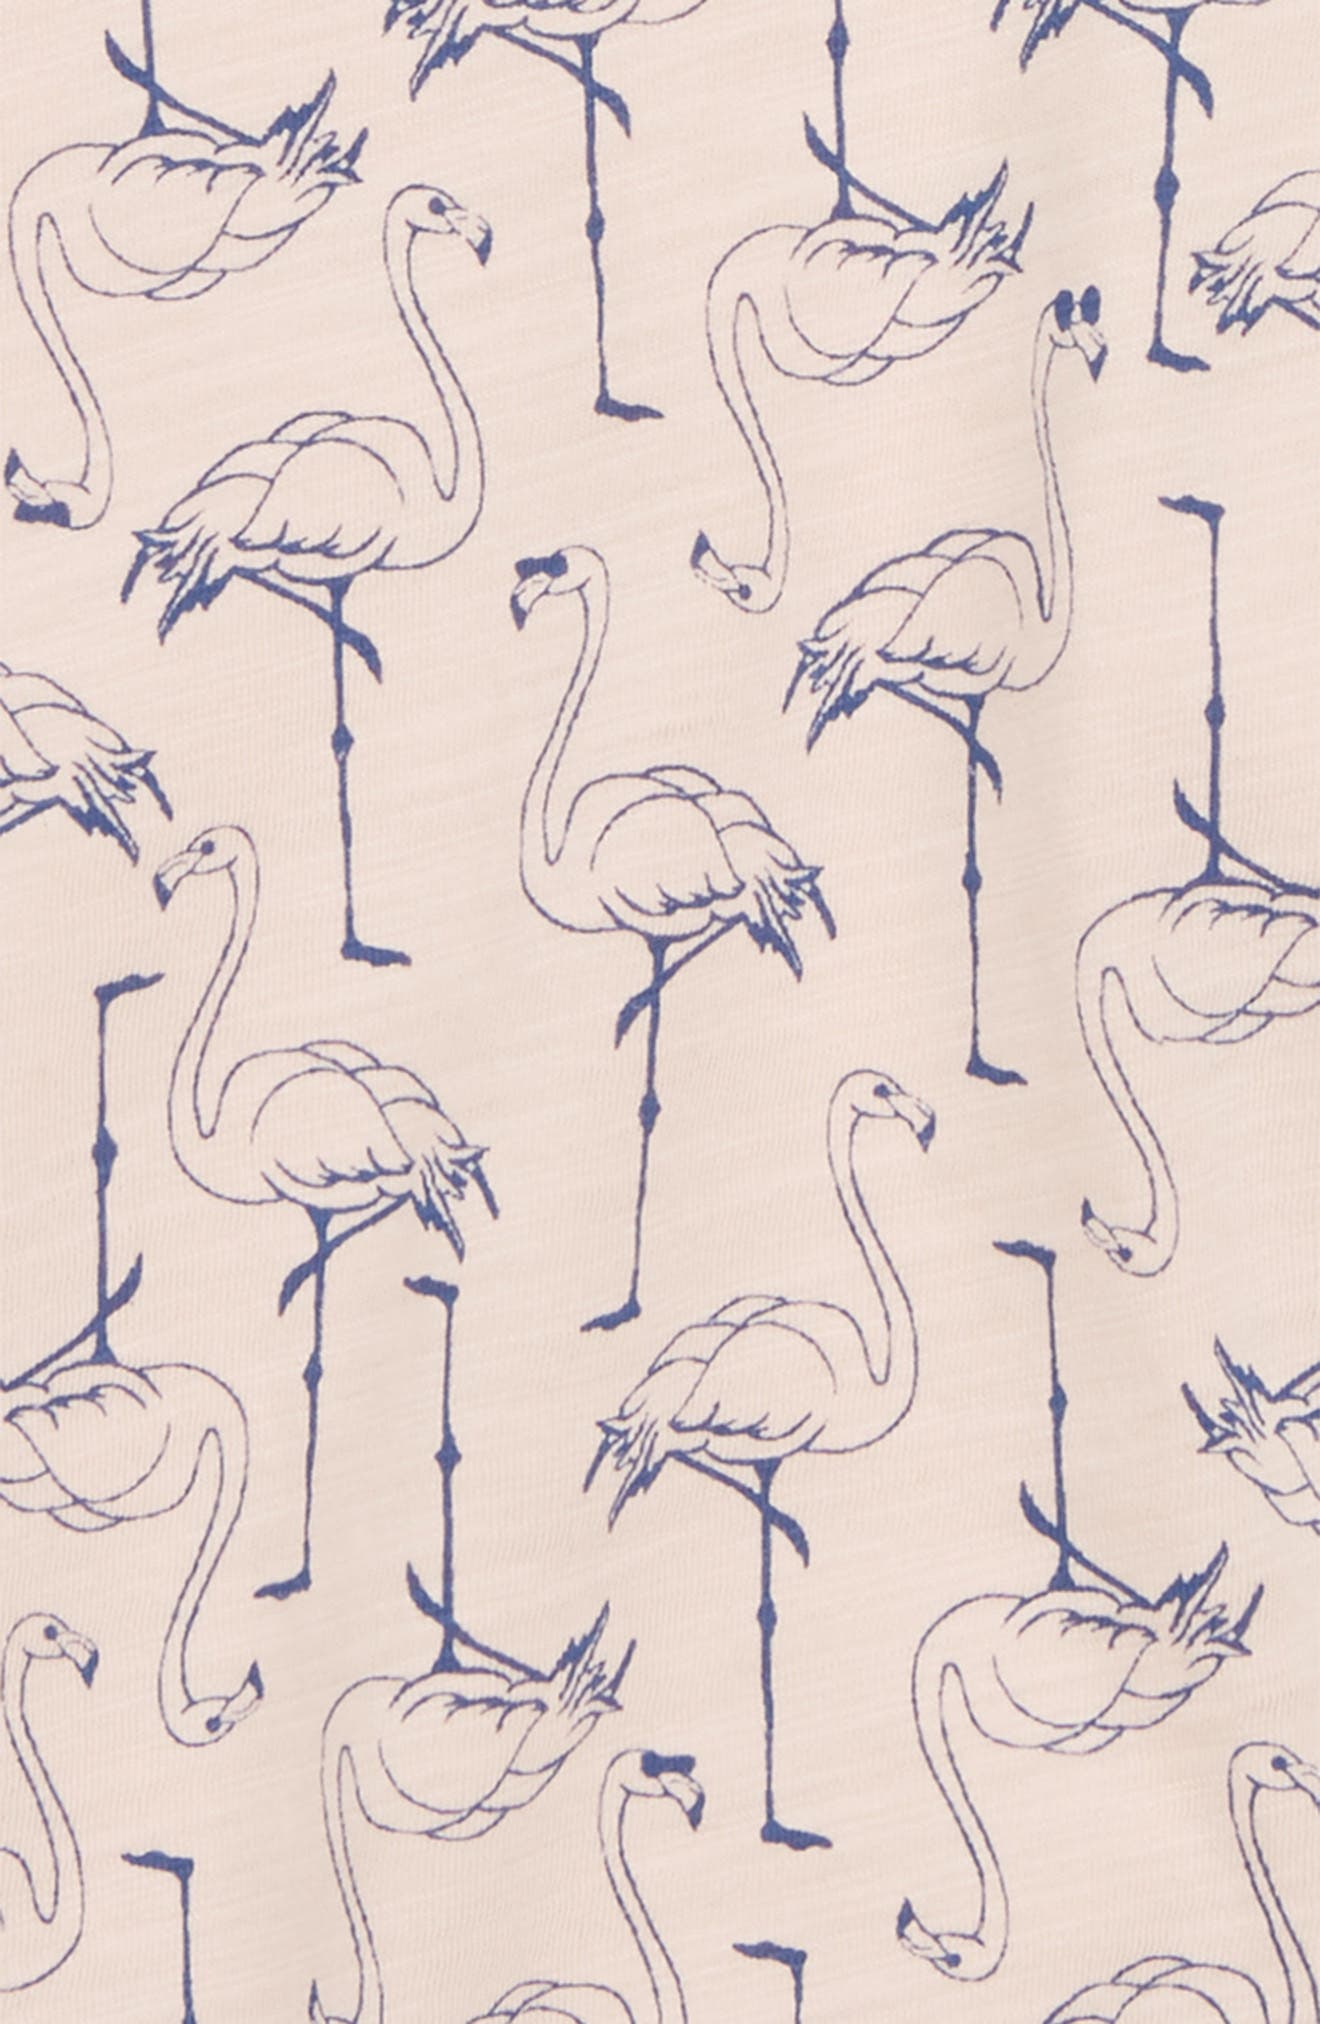 Flamingo Flutter Tee,                             Alternate thumbnail 2, color,                             650